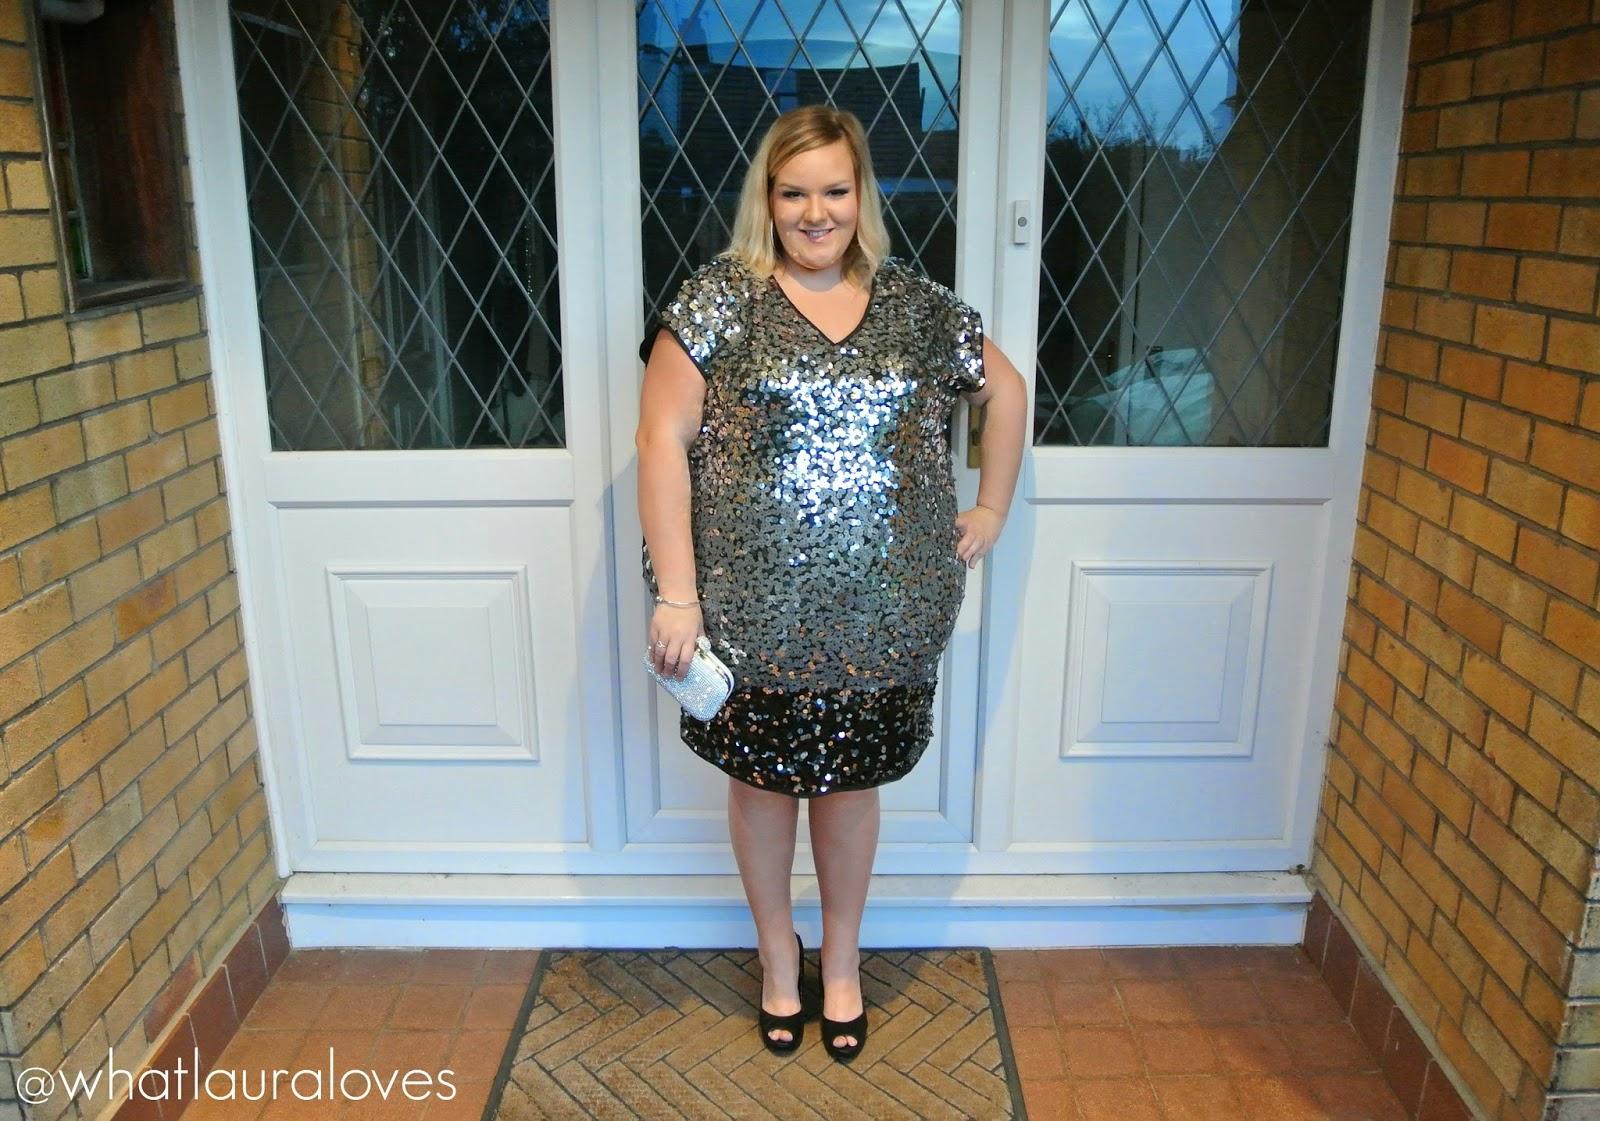 Best Christmas Office Party Dress Ideas Photos - Wedding Ideas ...